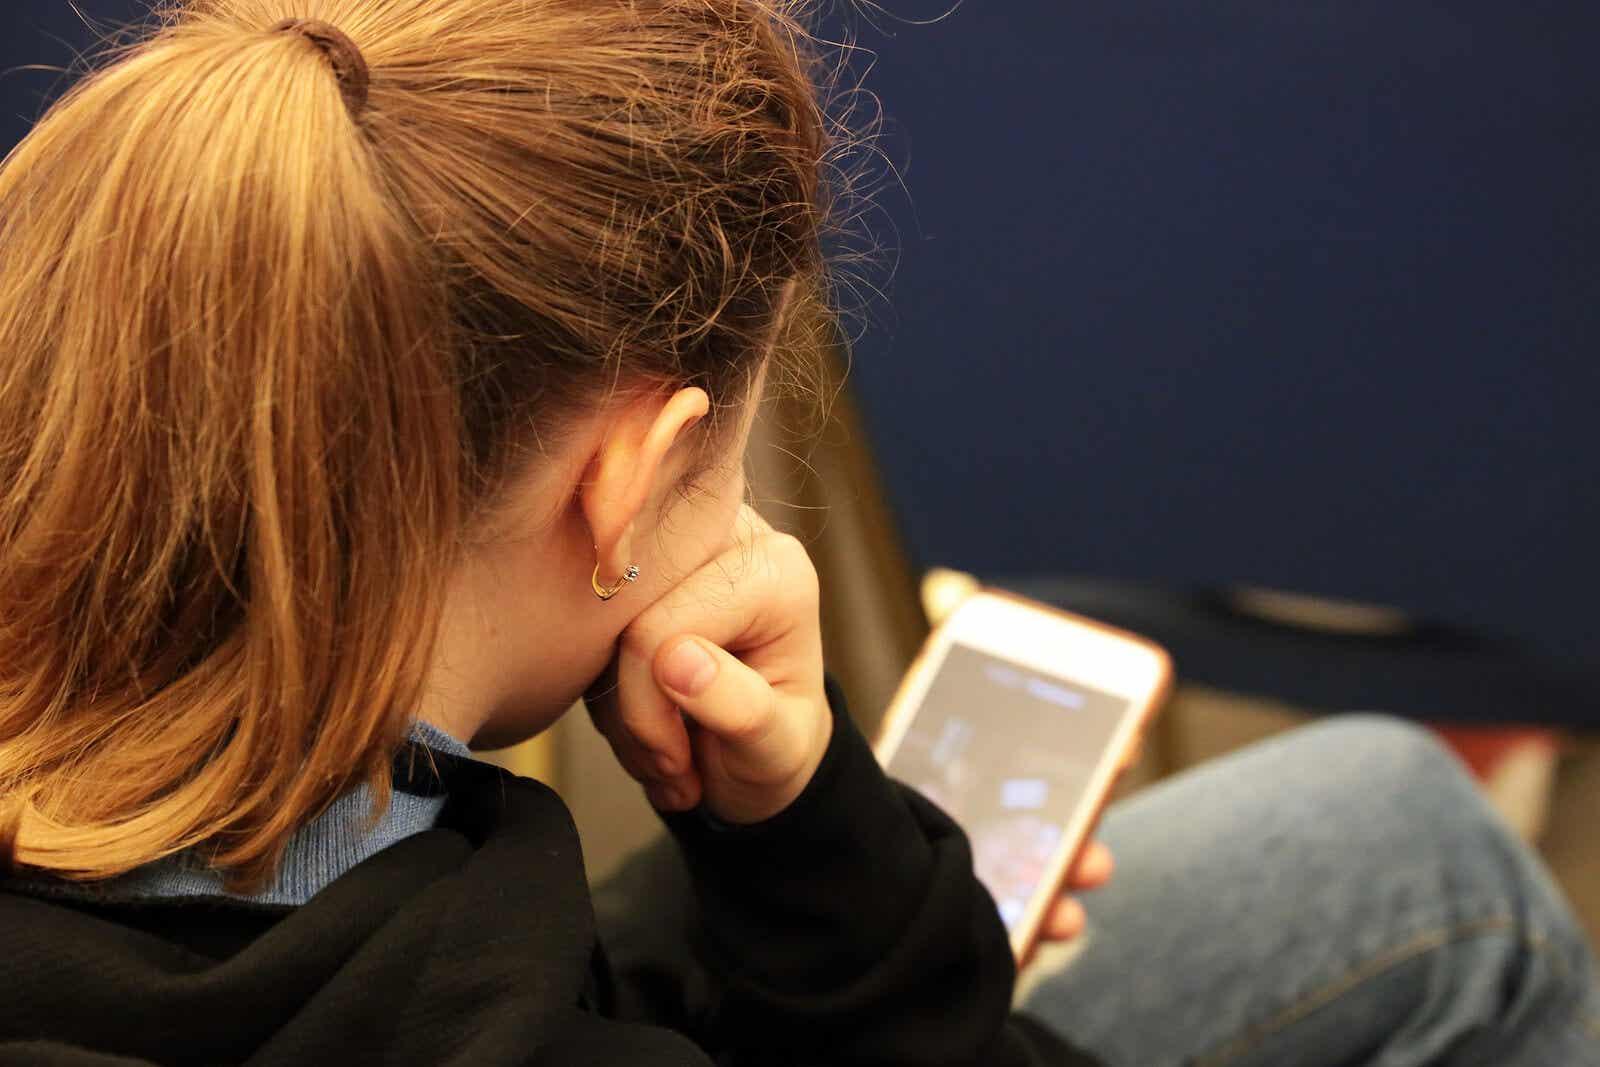 handysüchtig - Teenager checkt sein Mobiltelefon